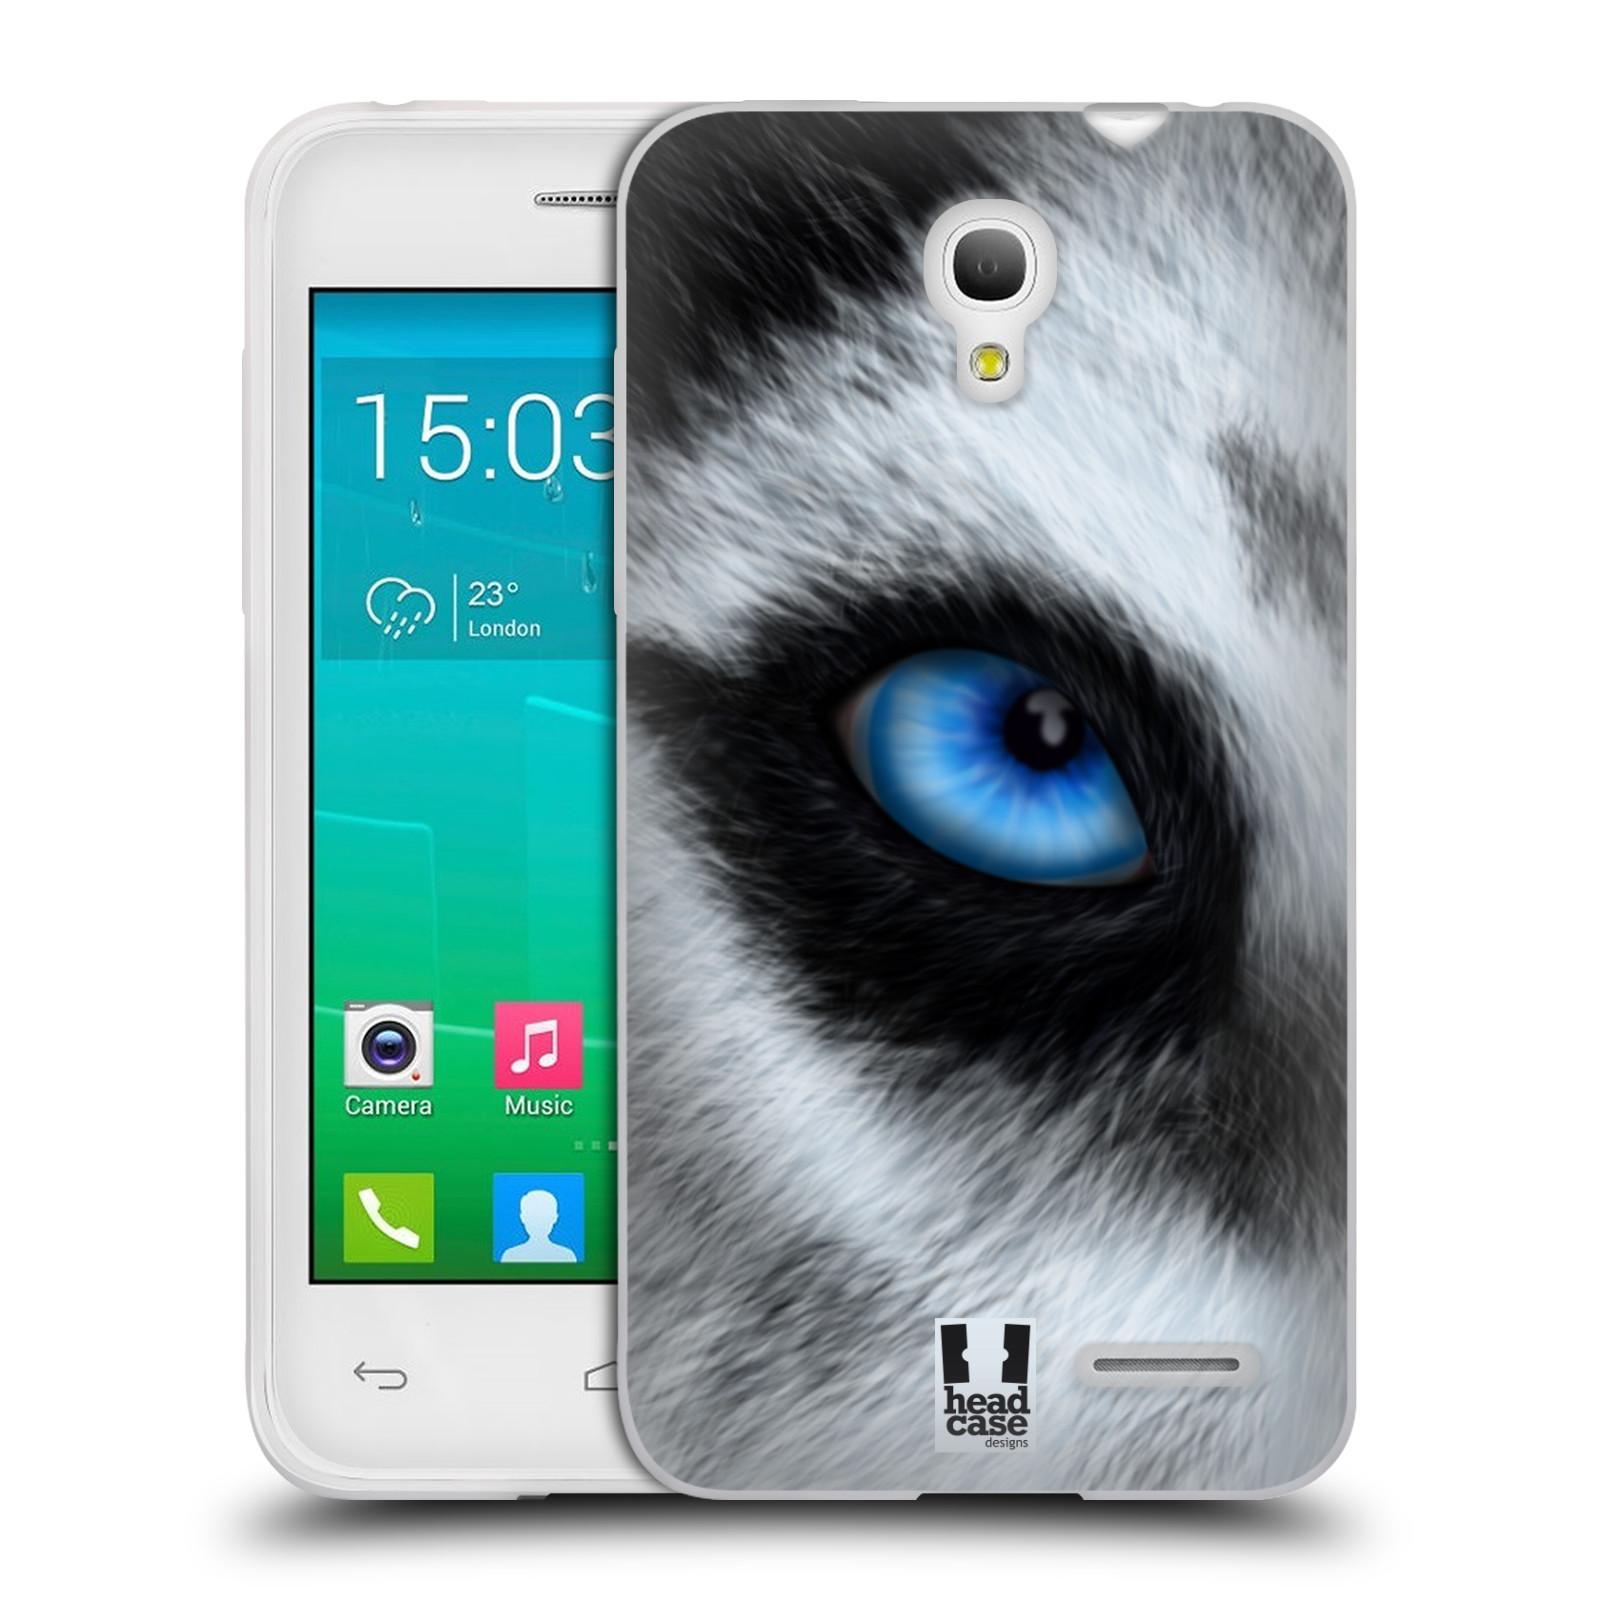 HEAD CASE silikonový obal na mobil Alcatel POP S3 OT-5050Y vzor pohled zvířete oko pes husky